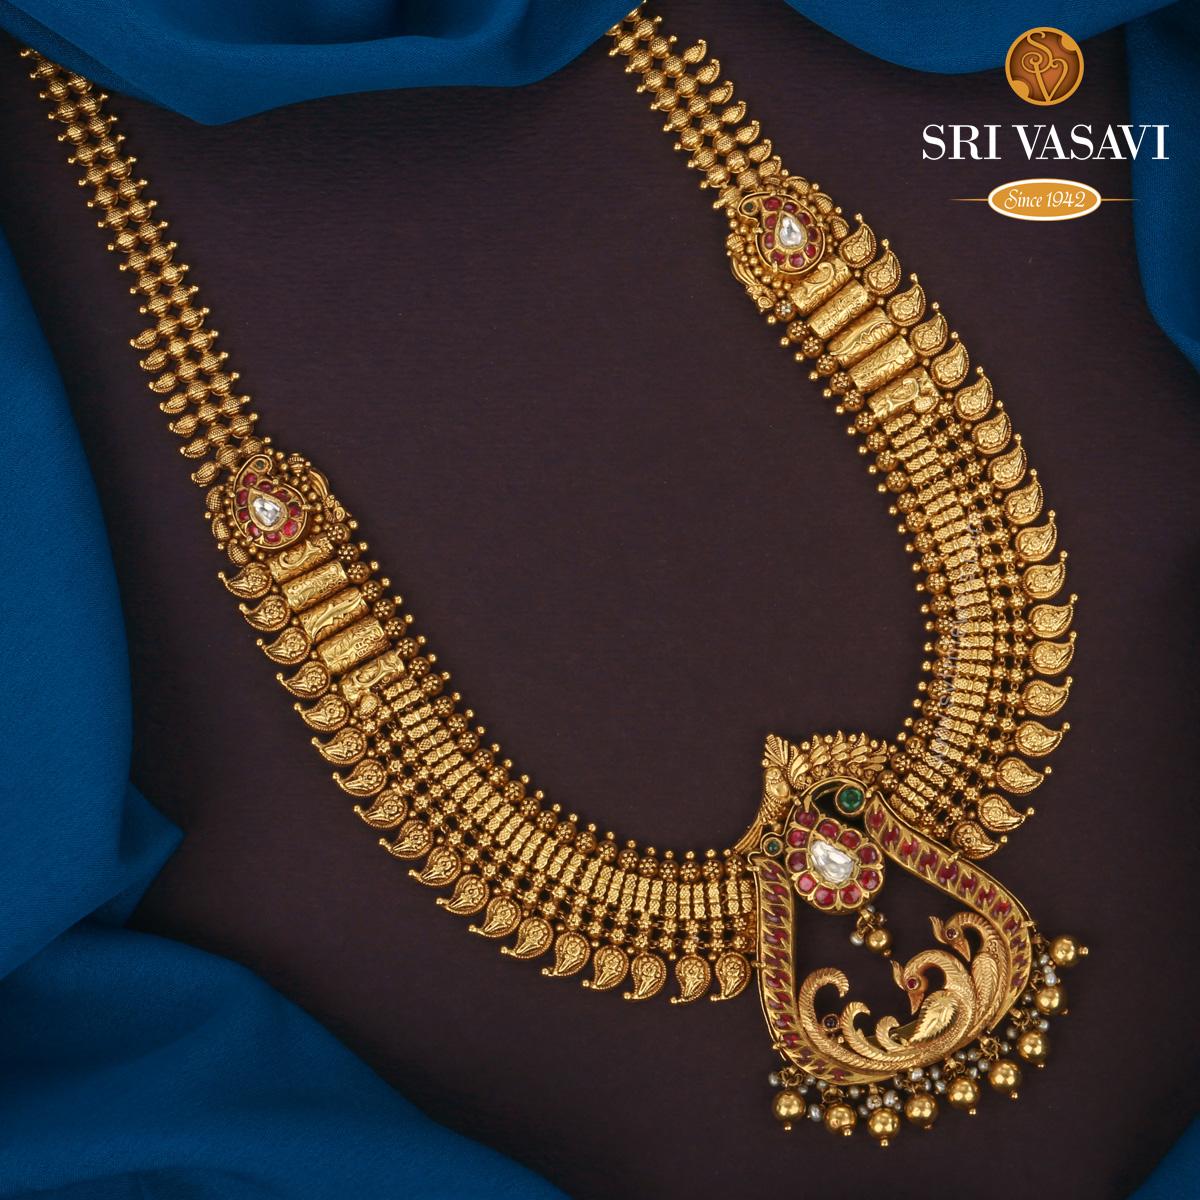 Indian Gold Necklace Online 22k Gold Necklace Set Online 22k Gold Jewelry Online